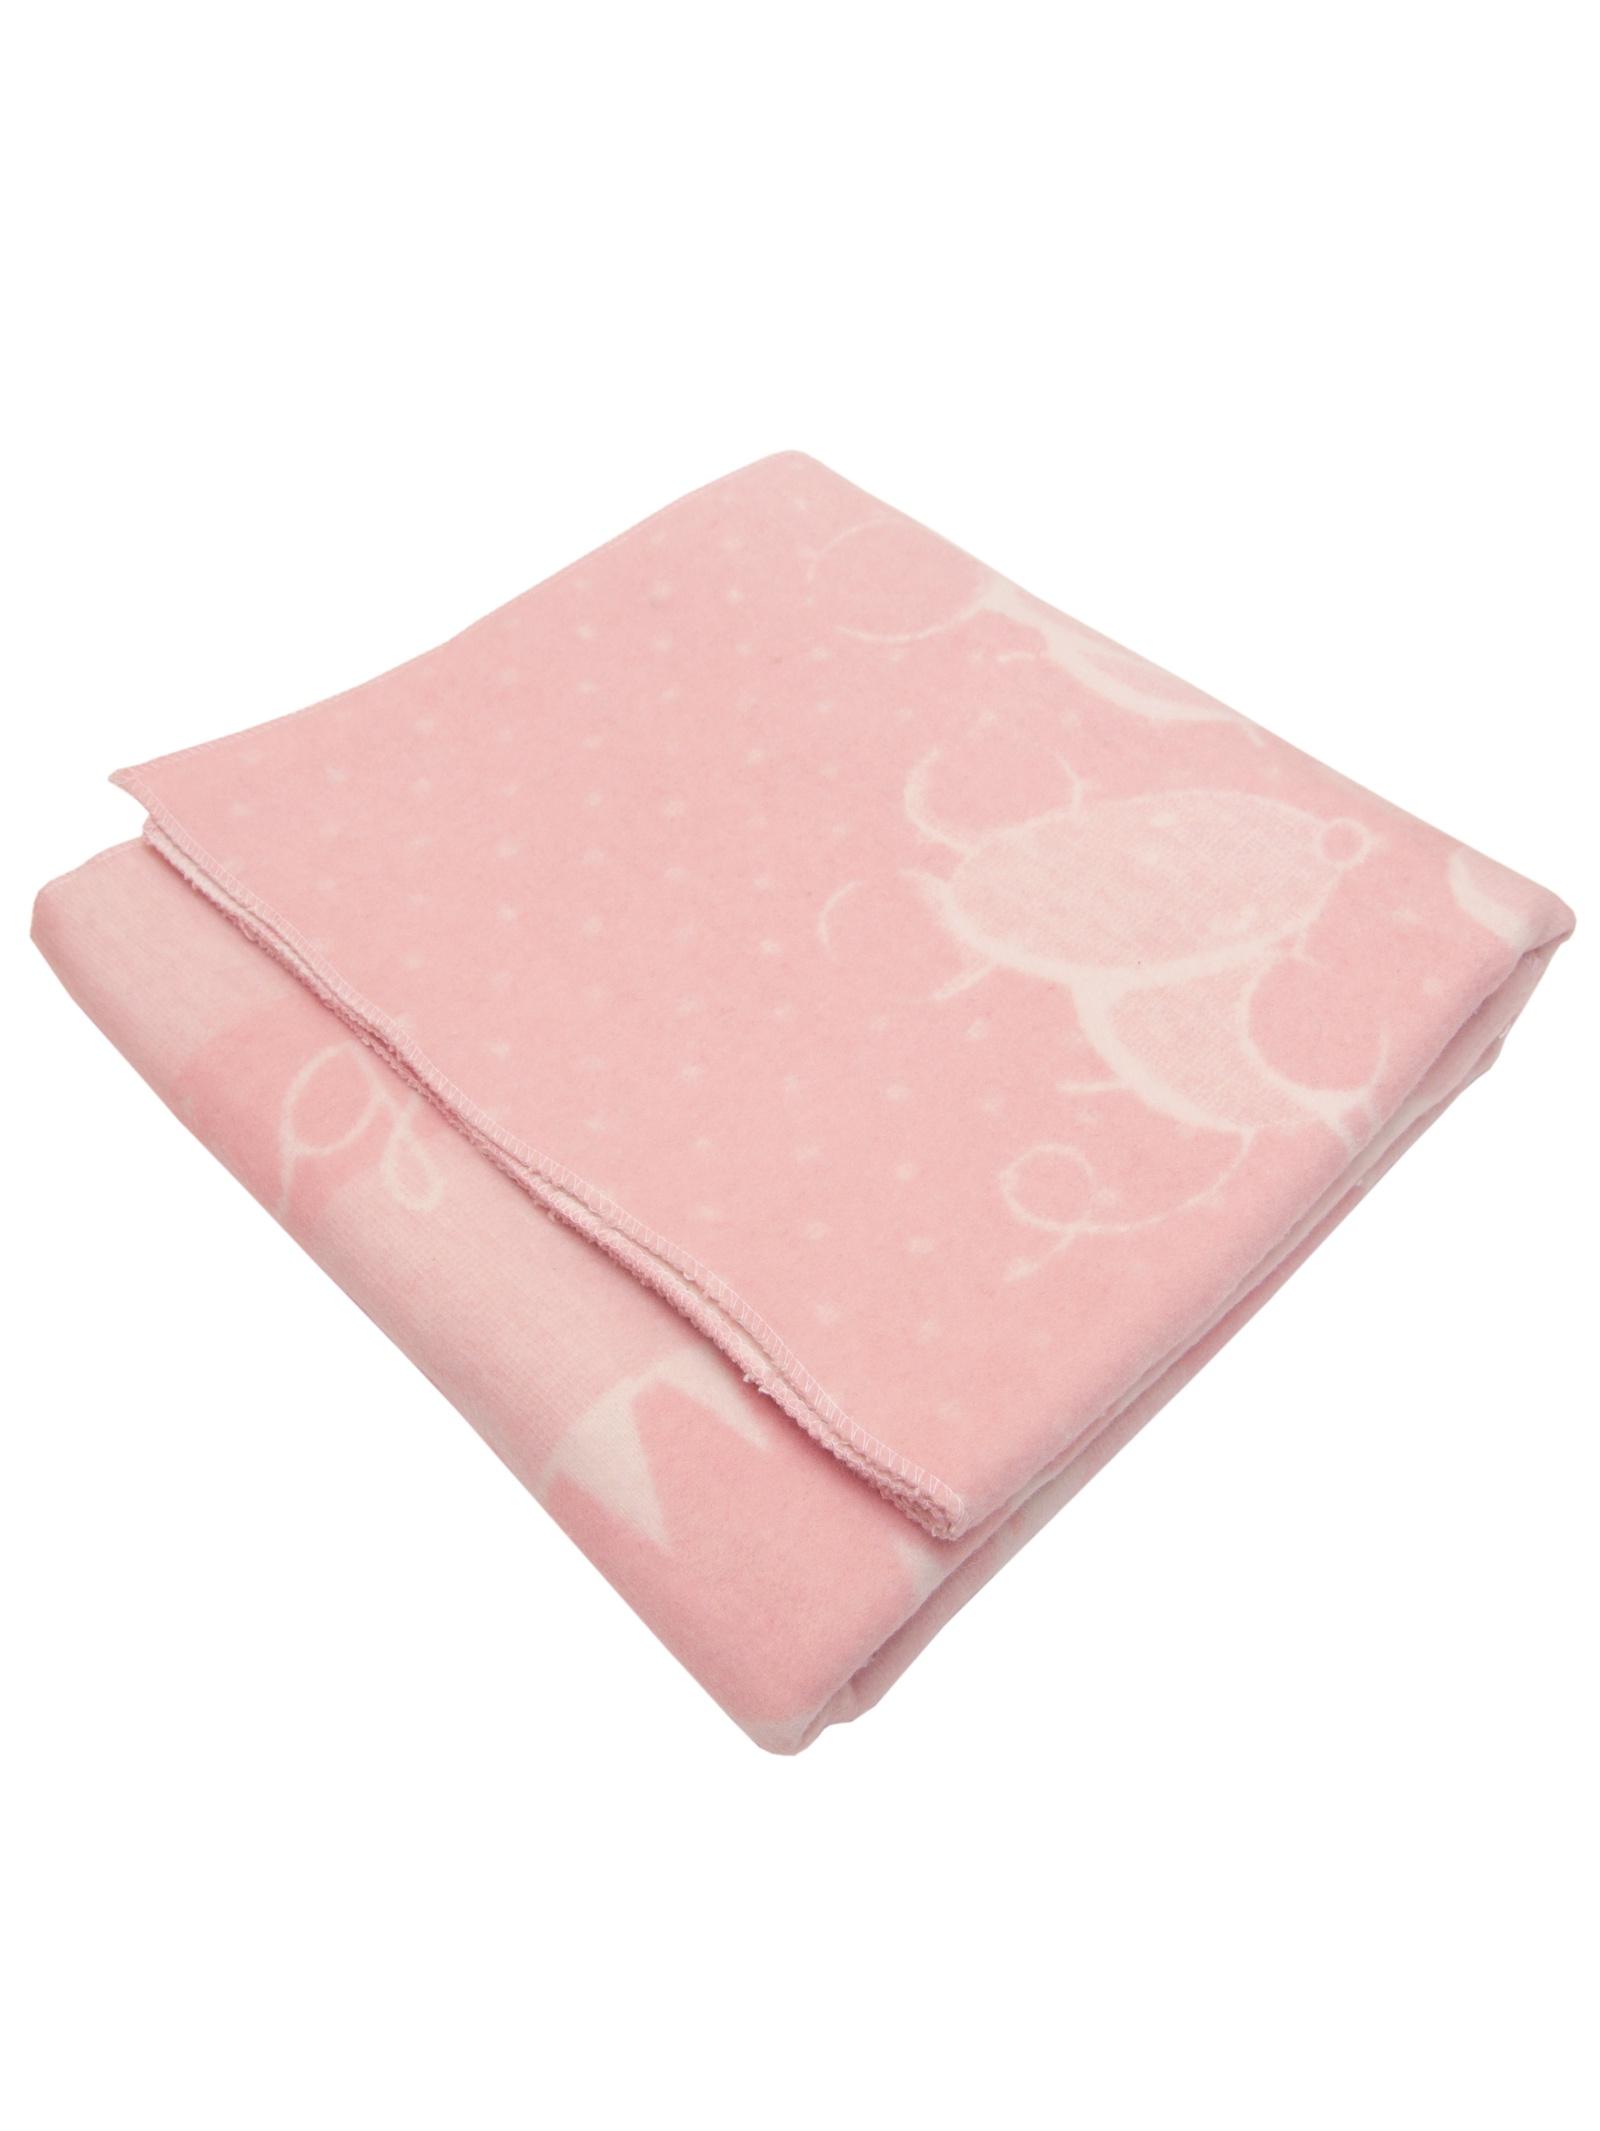 "Одеяло детское ""Микс"" Arloni, 27350.МК.Р, бело-розовый, 100х140 см"